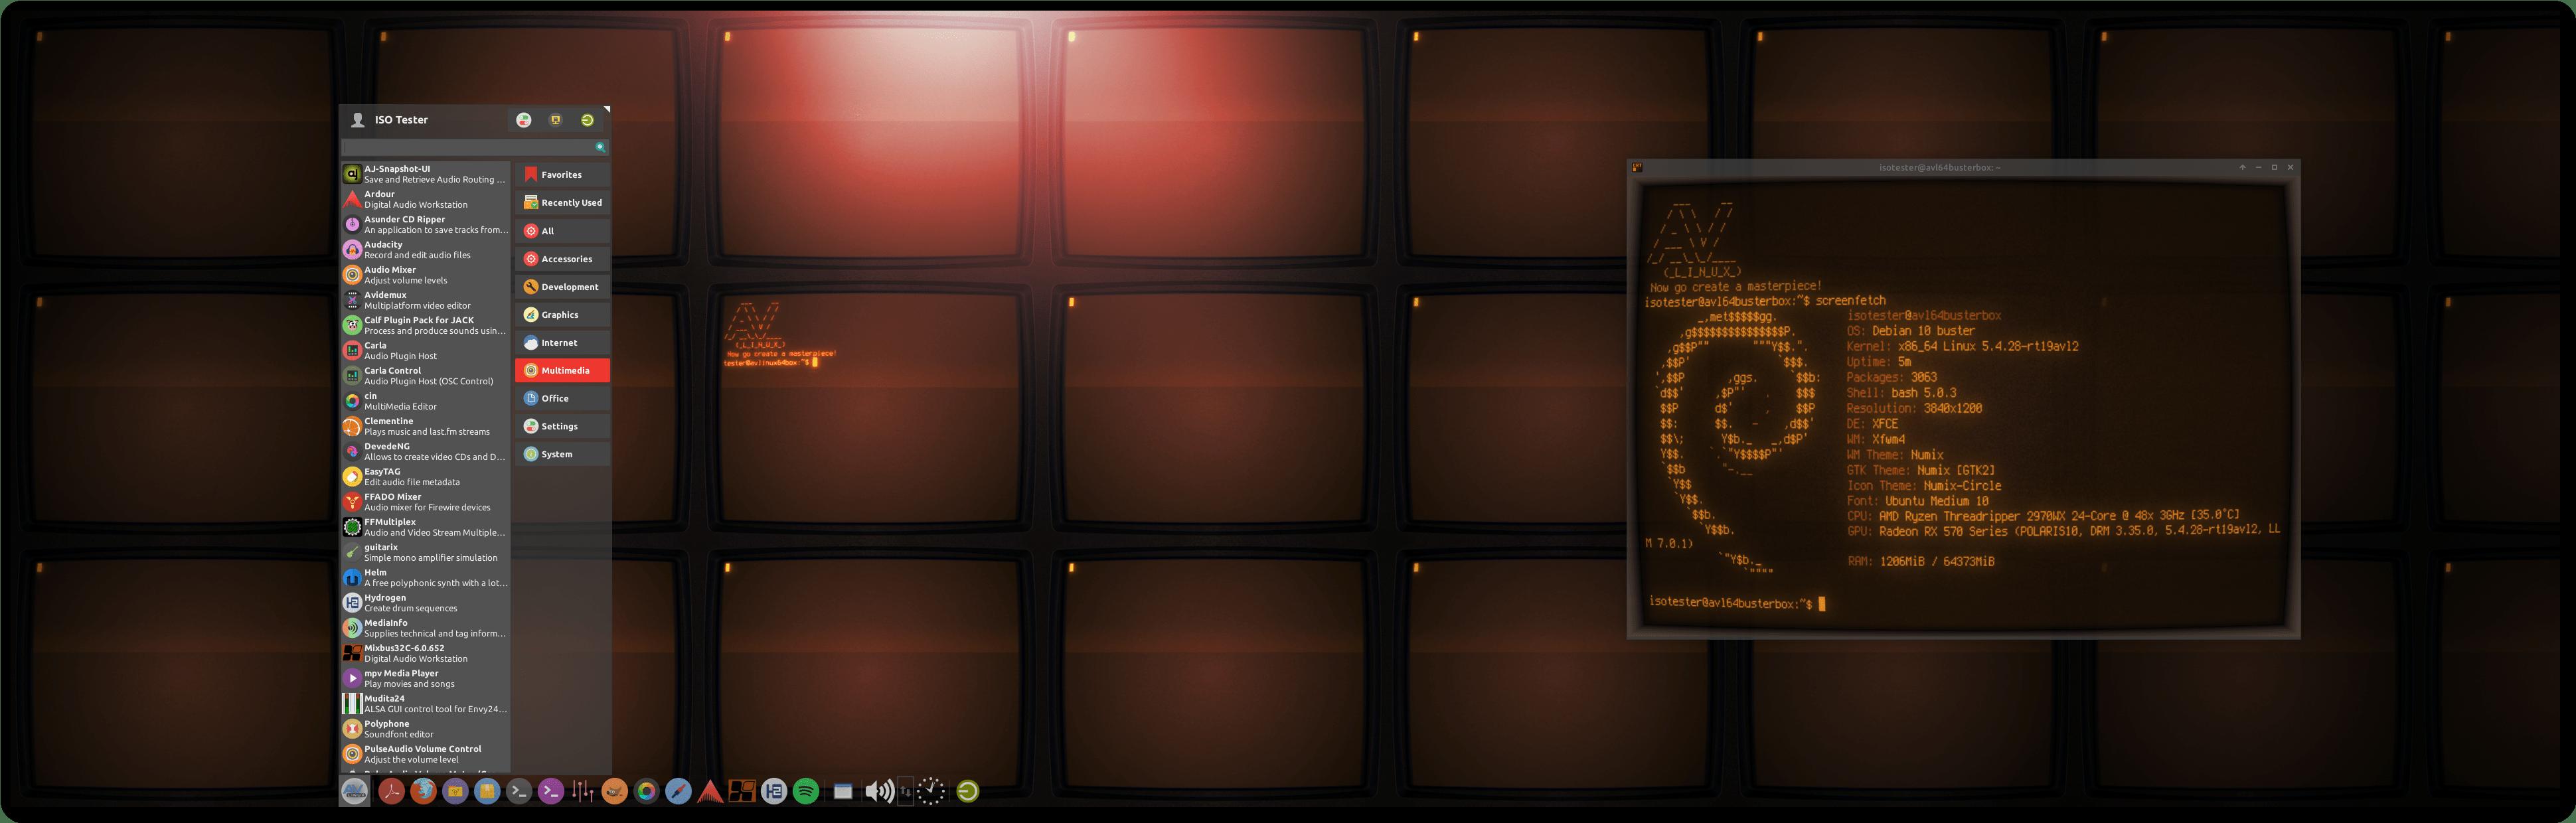 AVL-2020Desktop